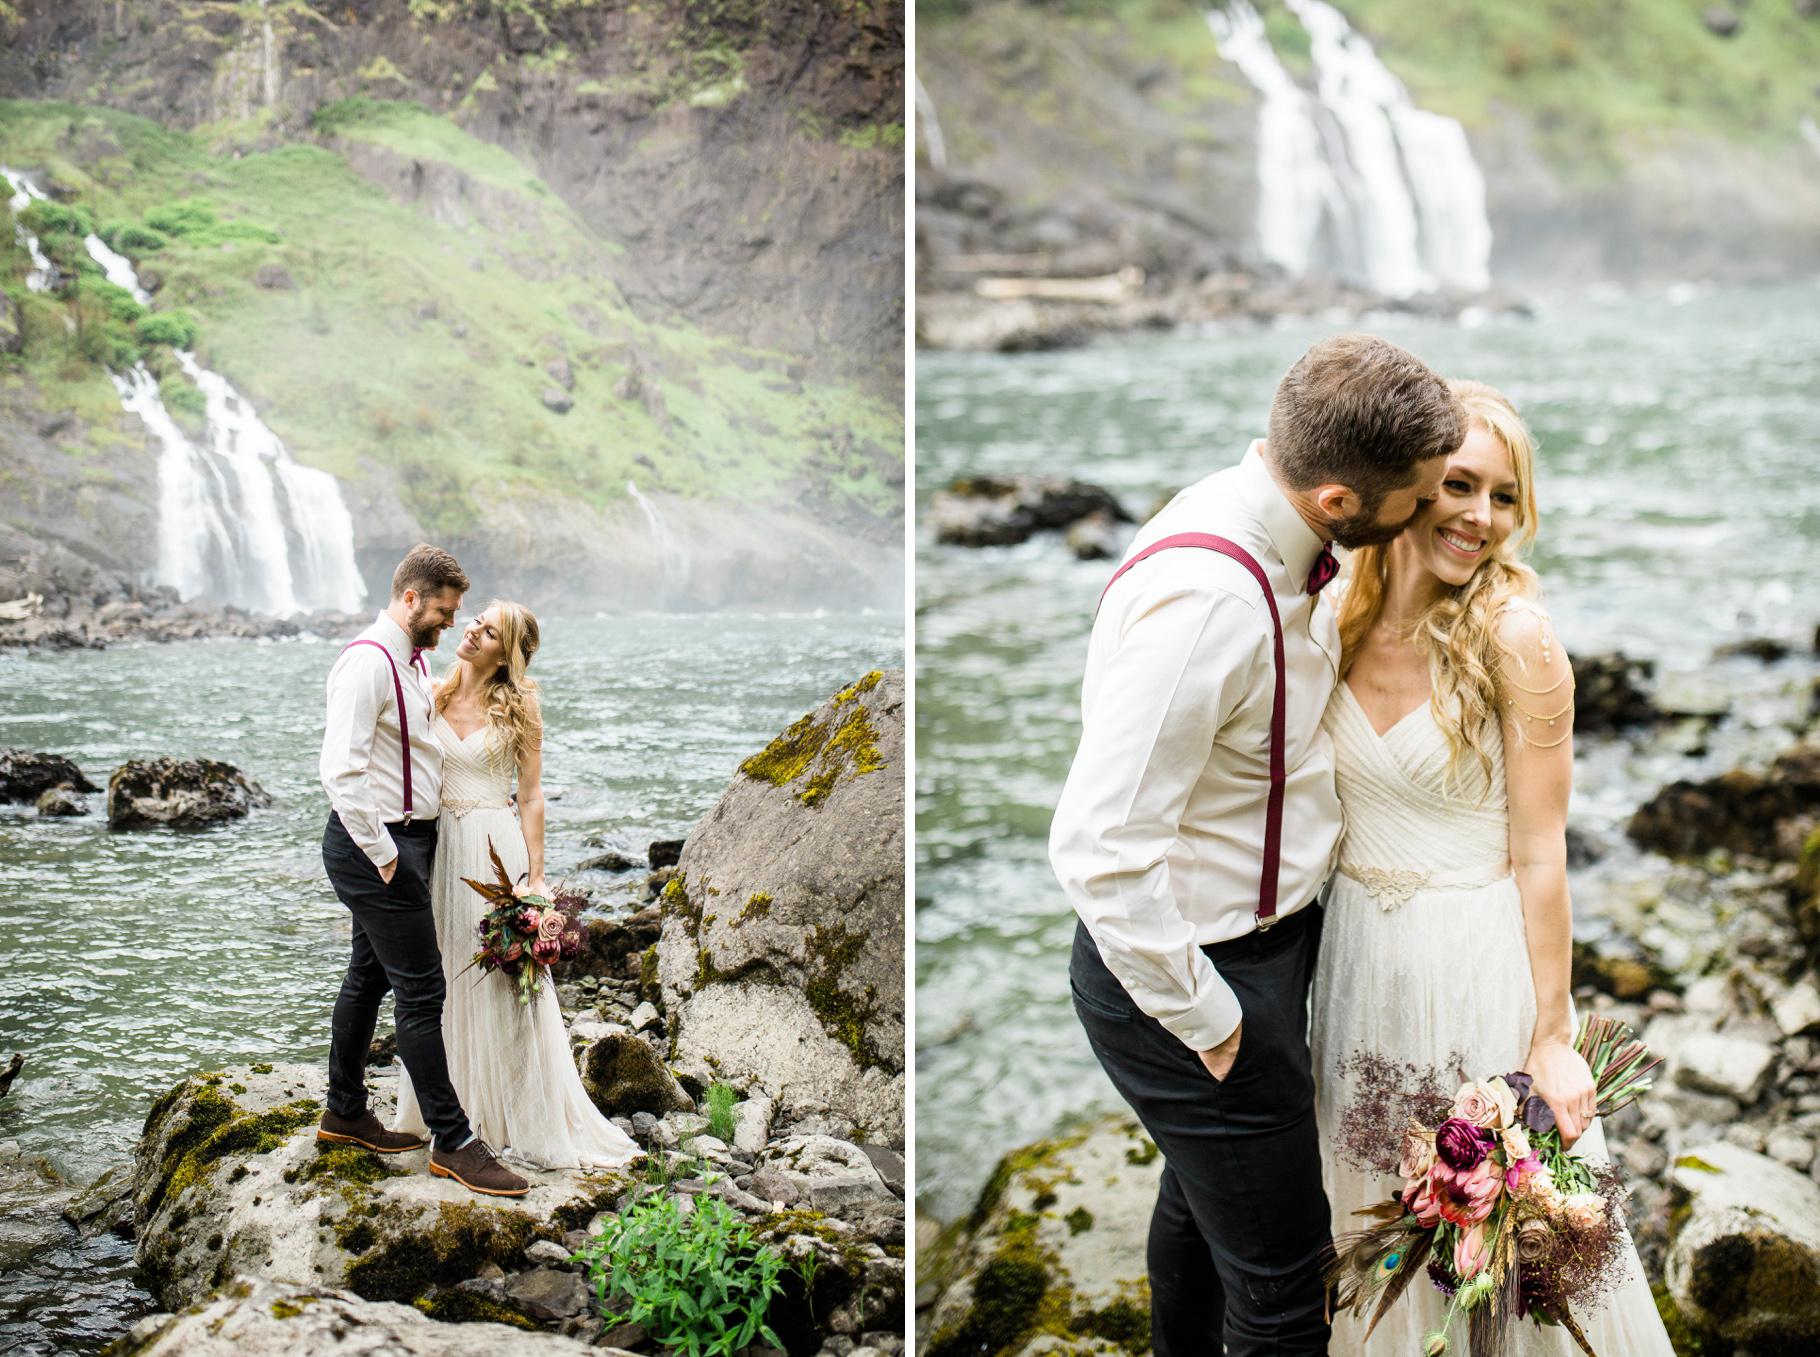 26-Adventure-Elopement-Waterfall-Seattle-Wedding-Photographer-Snoqualmie-Falls-Hike